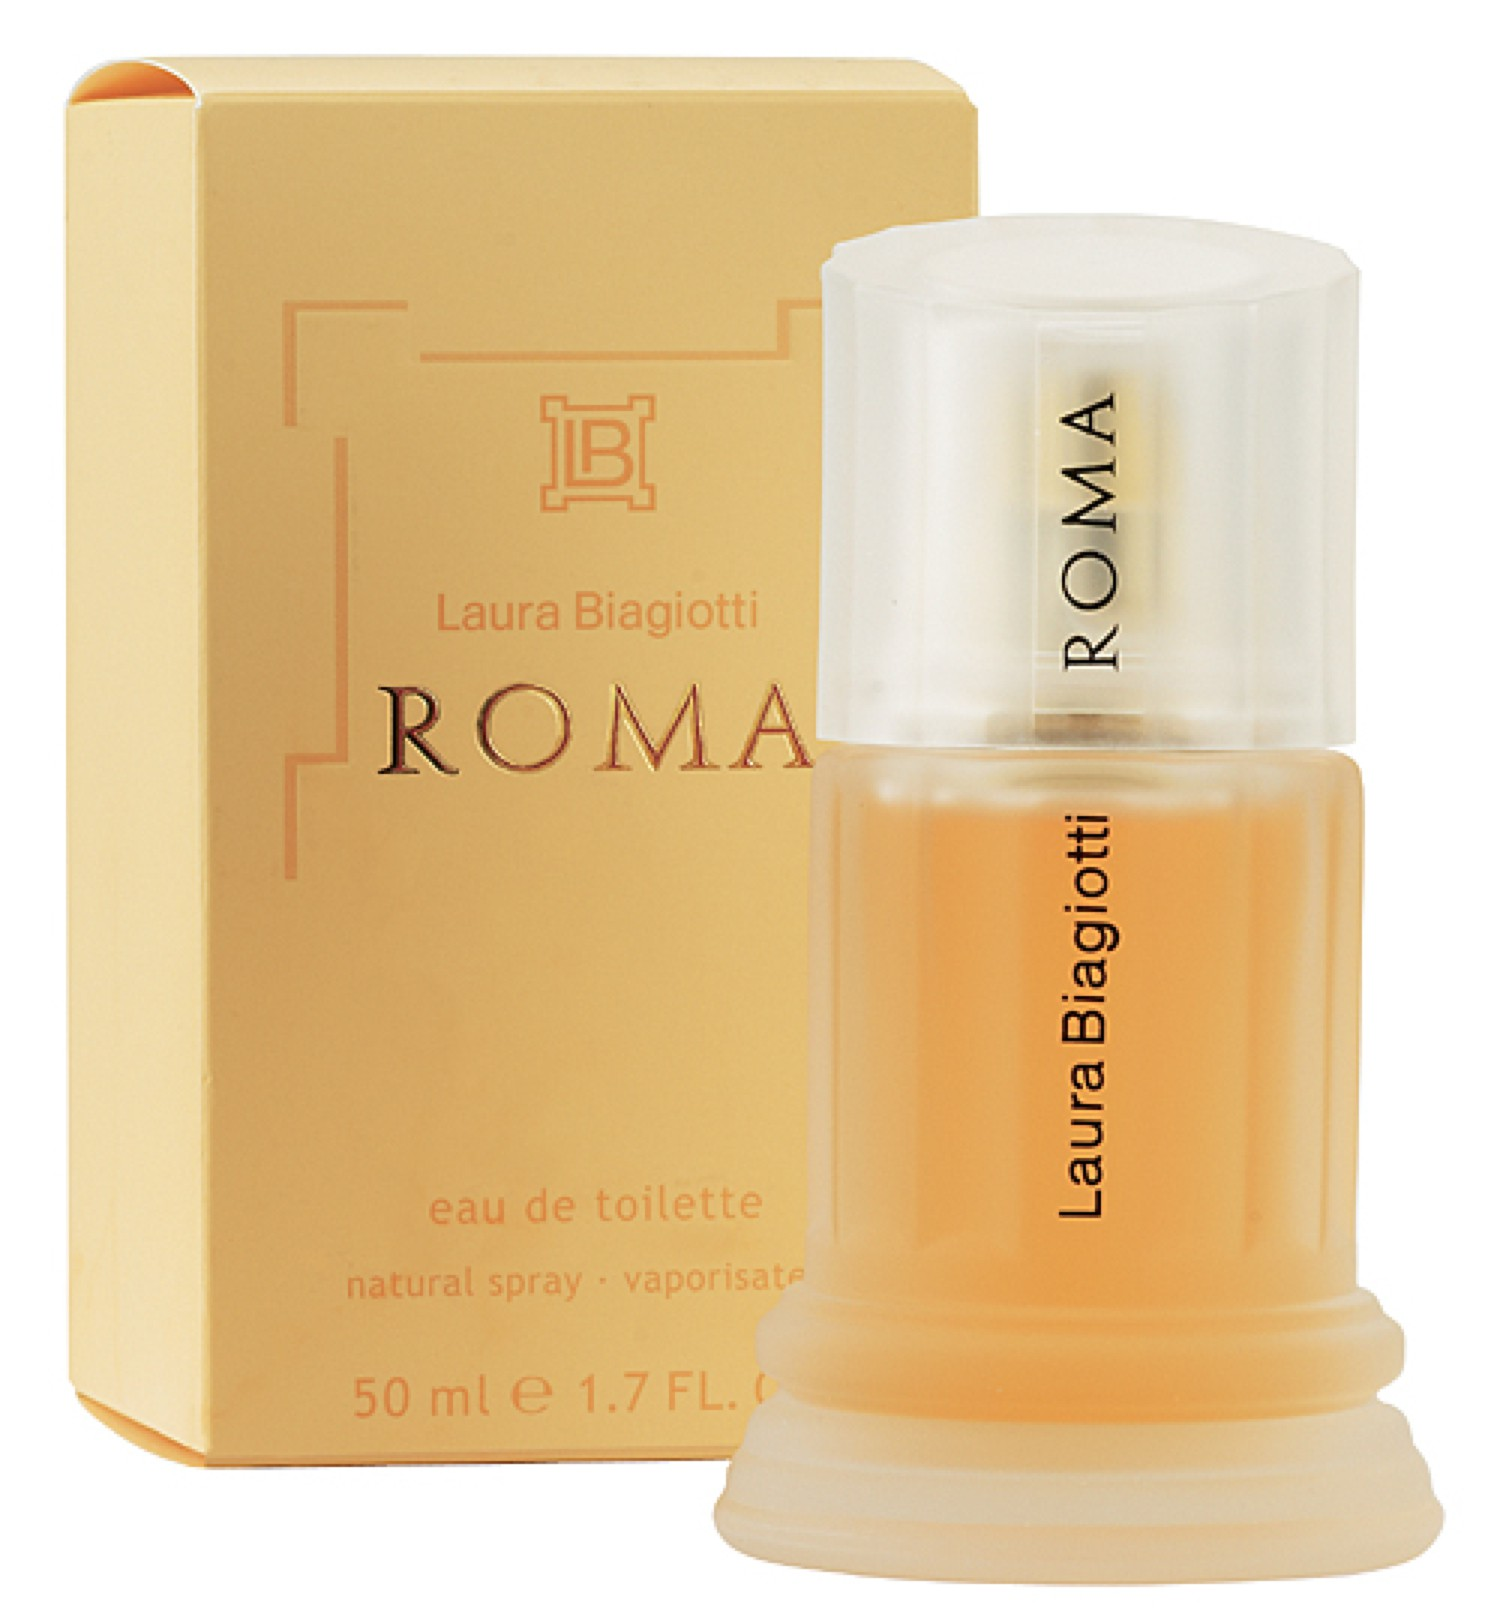 Laura Biagiotti Roma аромат для женщин